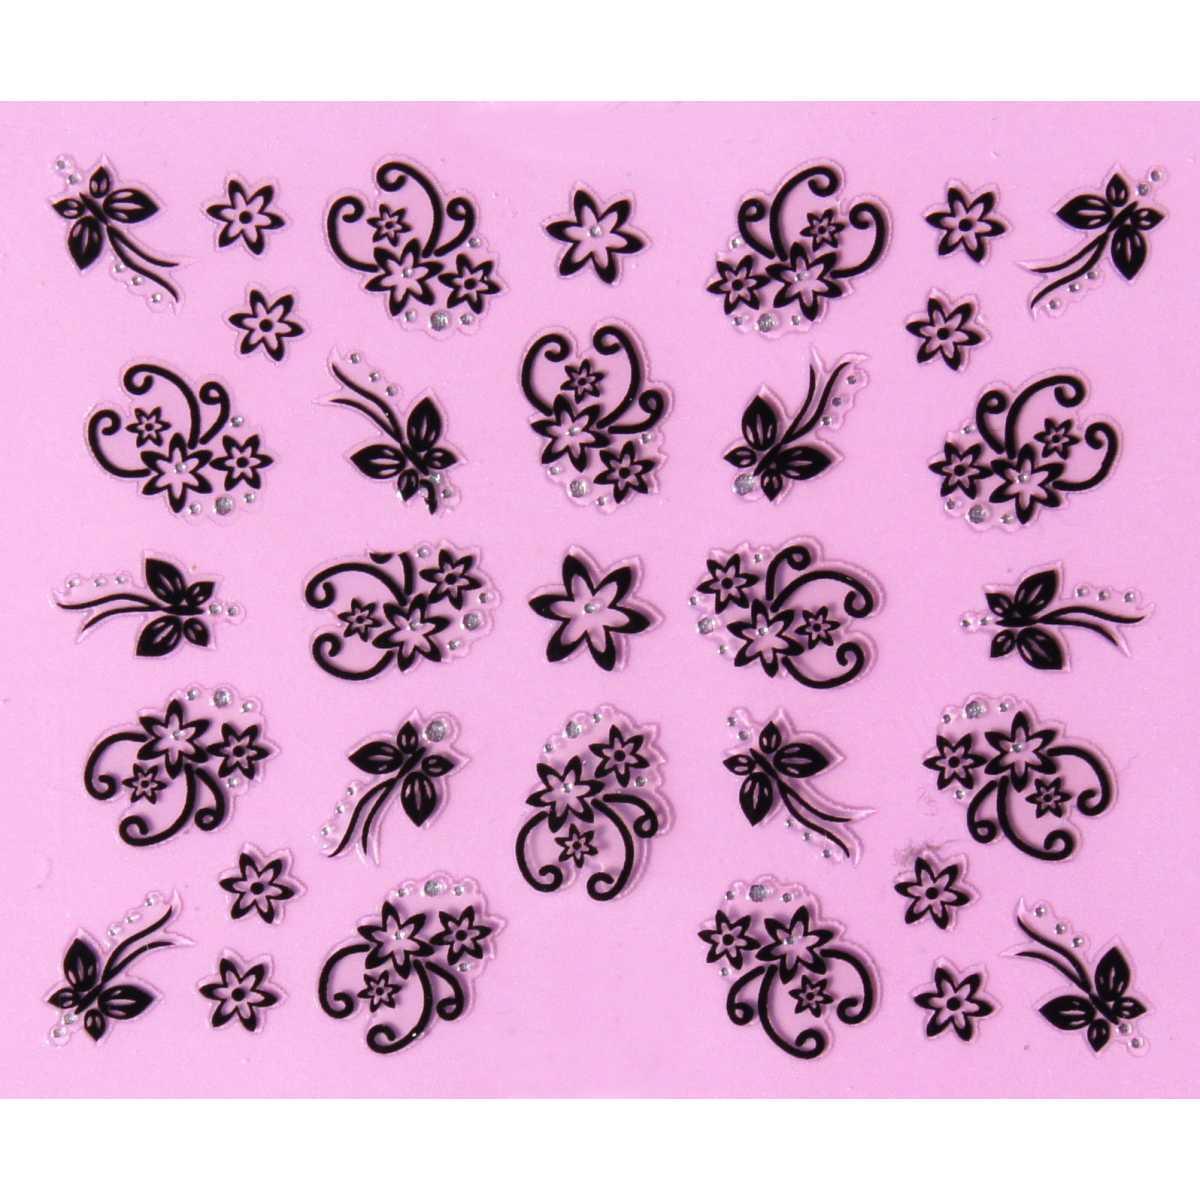 https://www.kit-manucure.com/742-thickbox_default/stickers-nail-art-fleur-papillons-et-strass-argent.jpg